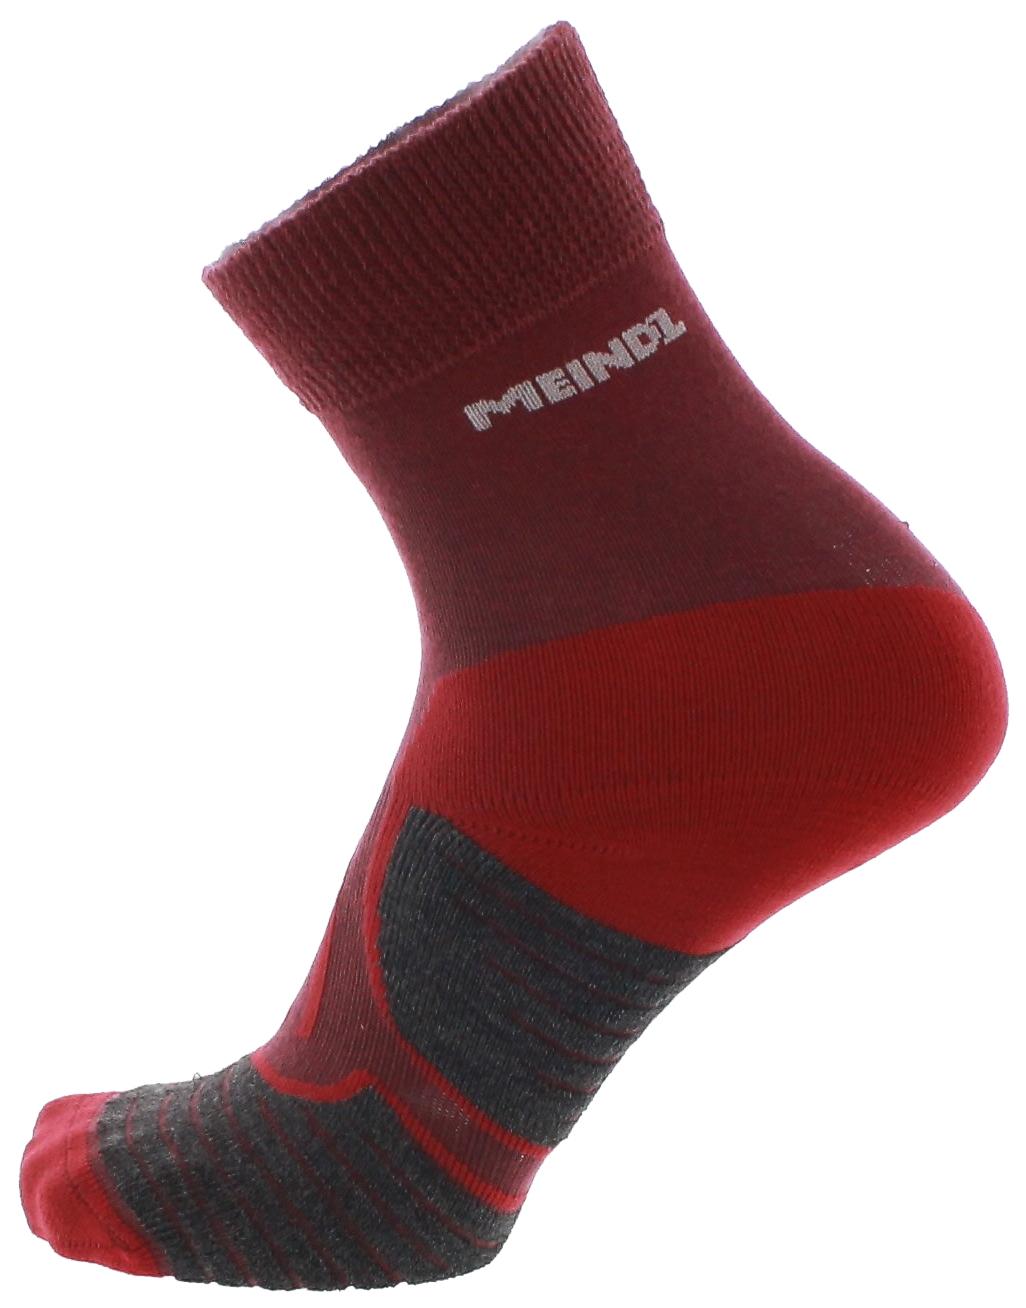 Meindl MT2 TREKKING BASIC Socke Lady Aubergine